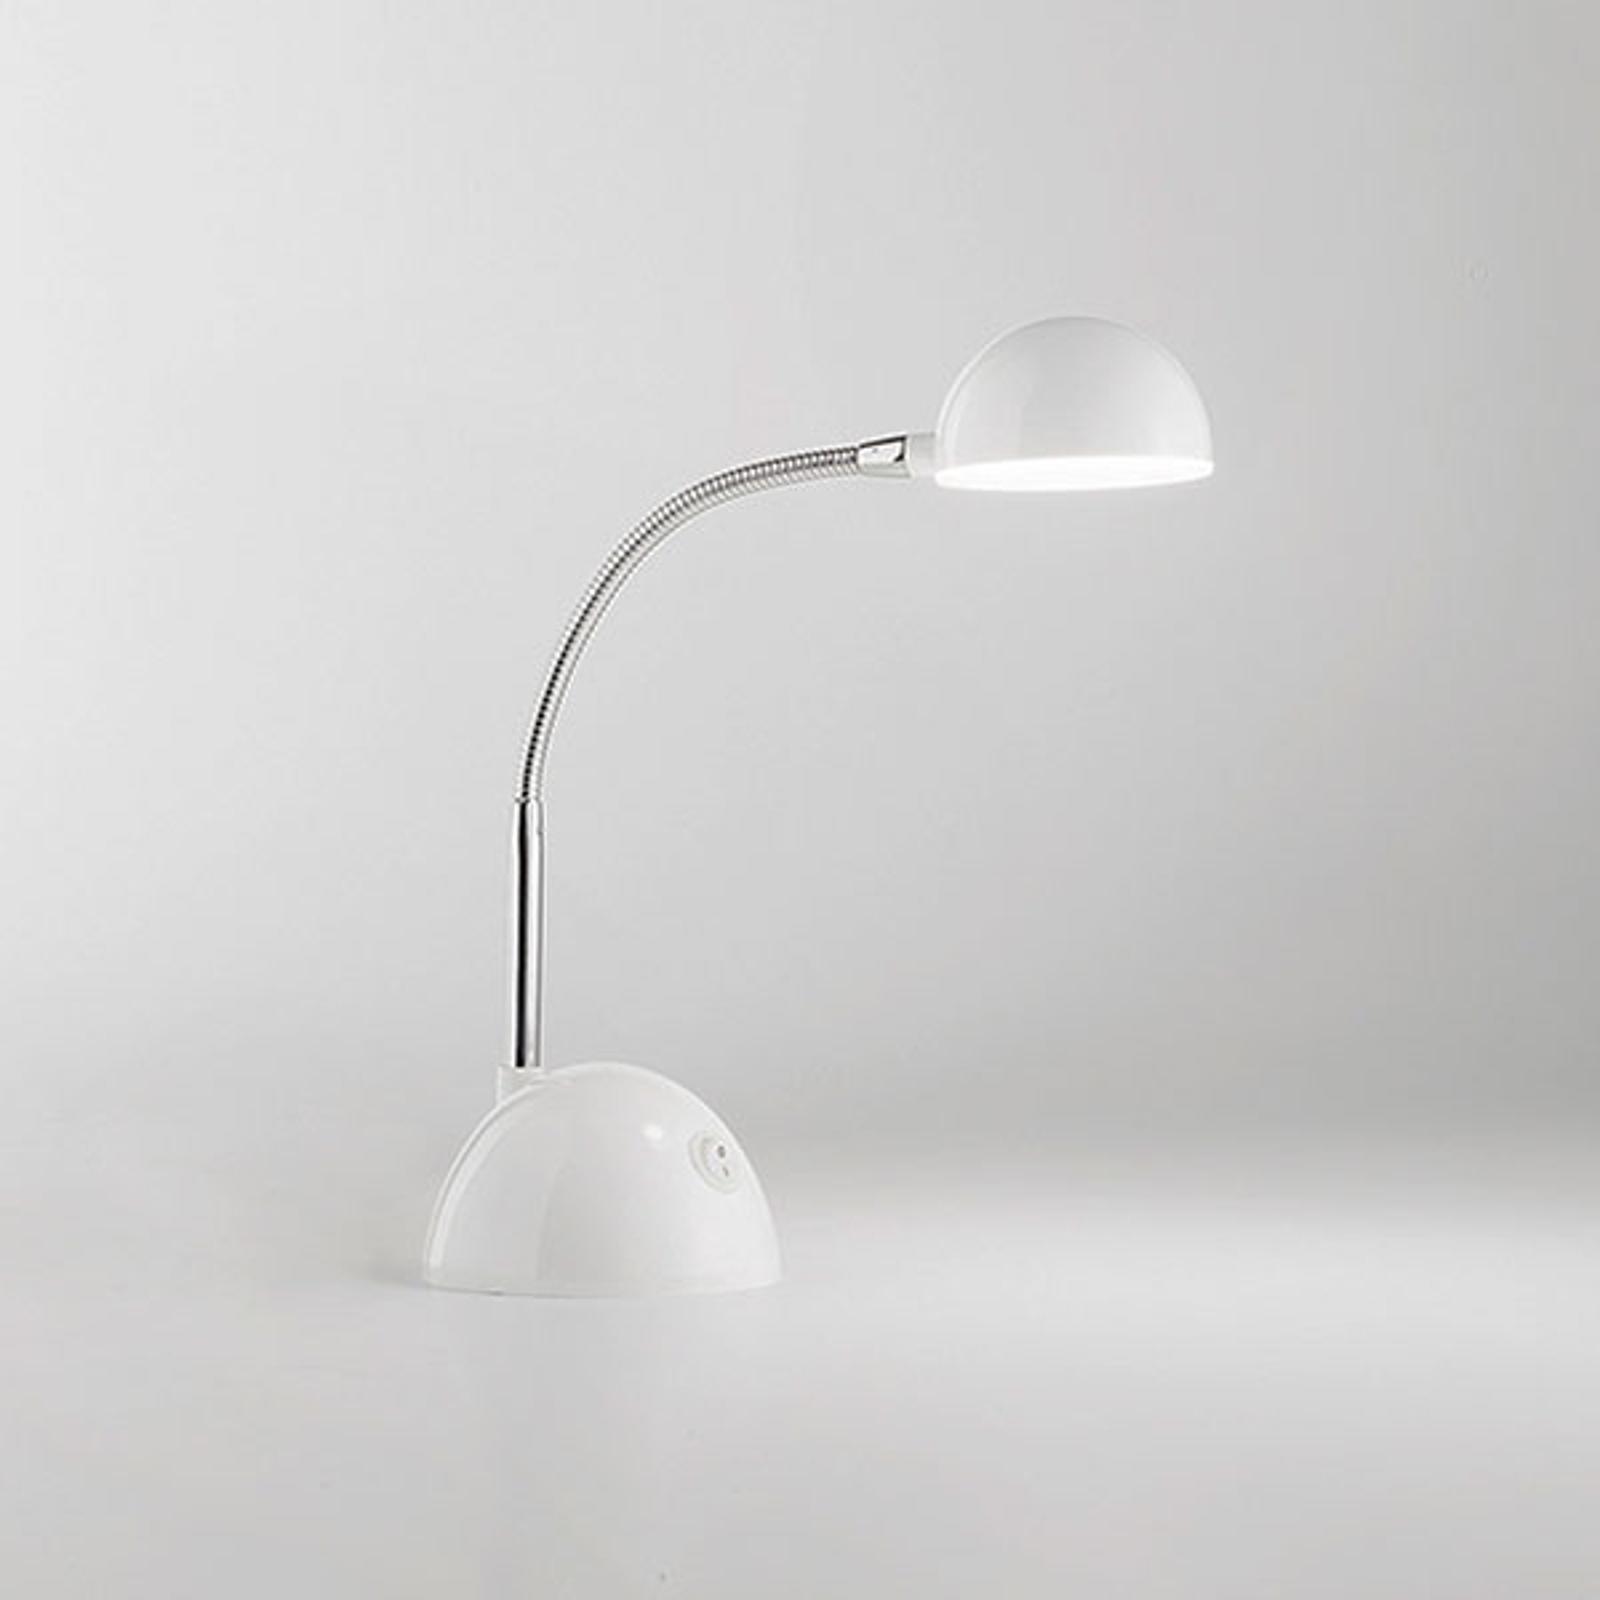 Lampe à poser LED 6512 avec bras flexible, blanc